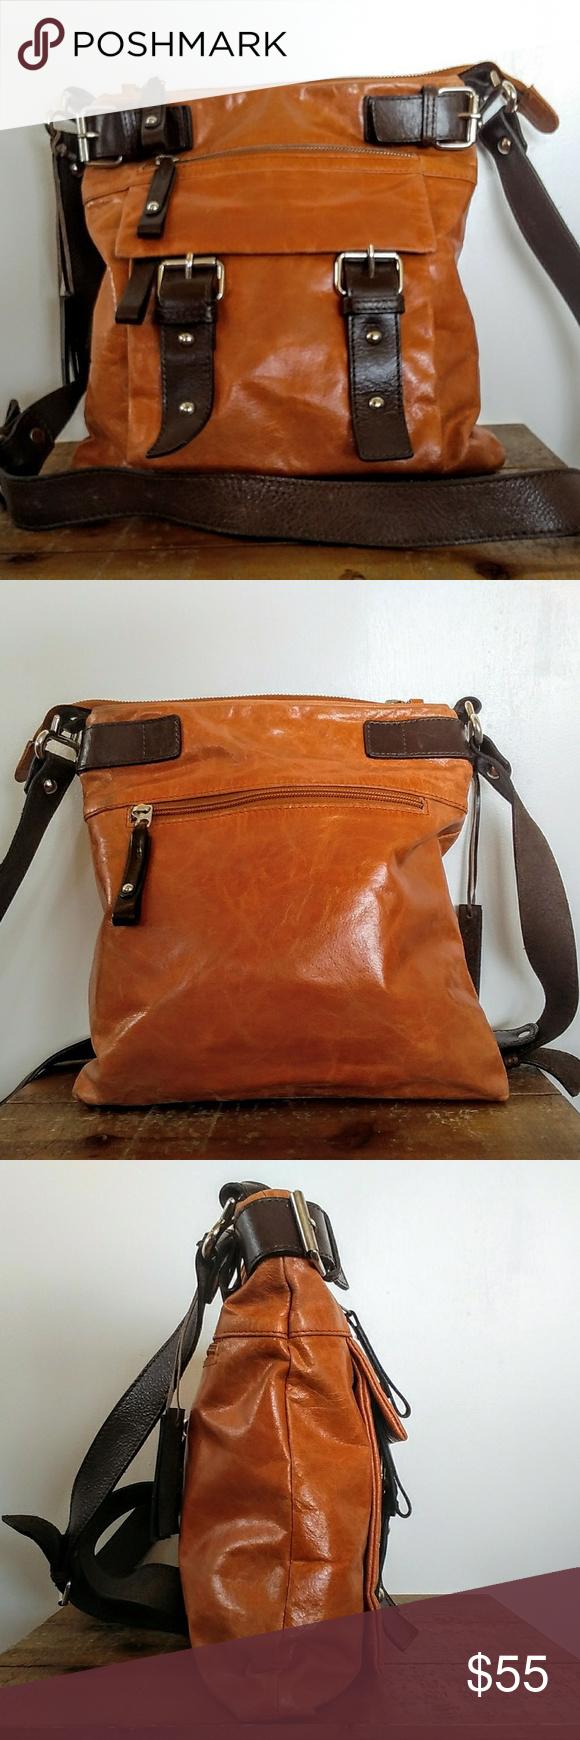 ba36c236b812 Tano Leather Crossbody Bag Gorgeous leather crossbody from Tano